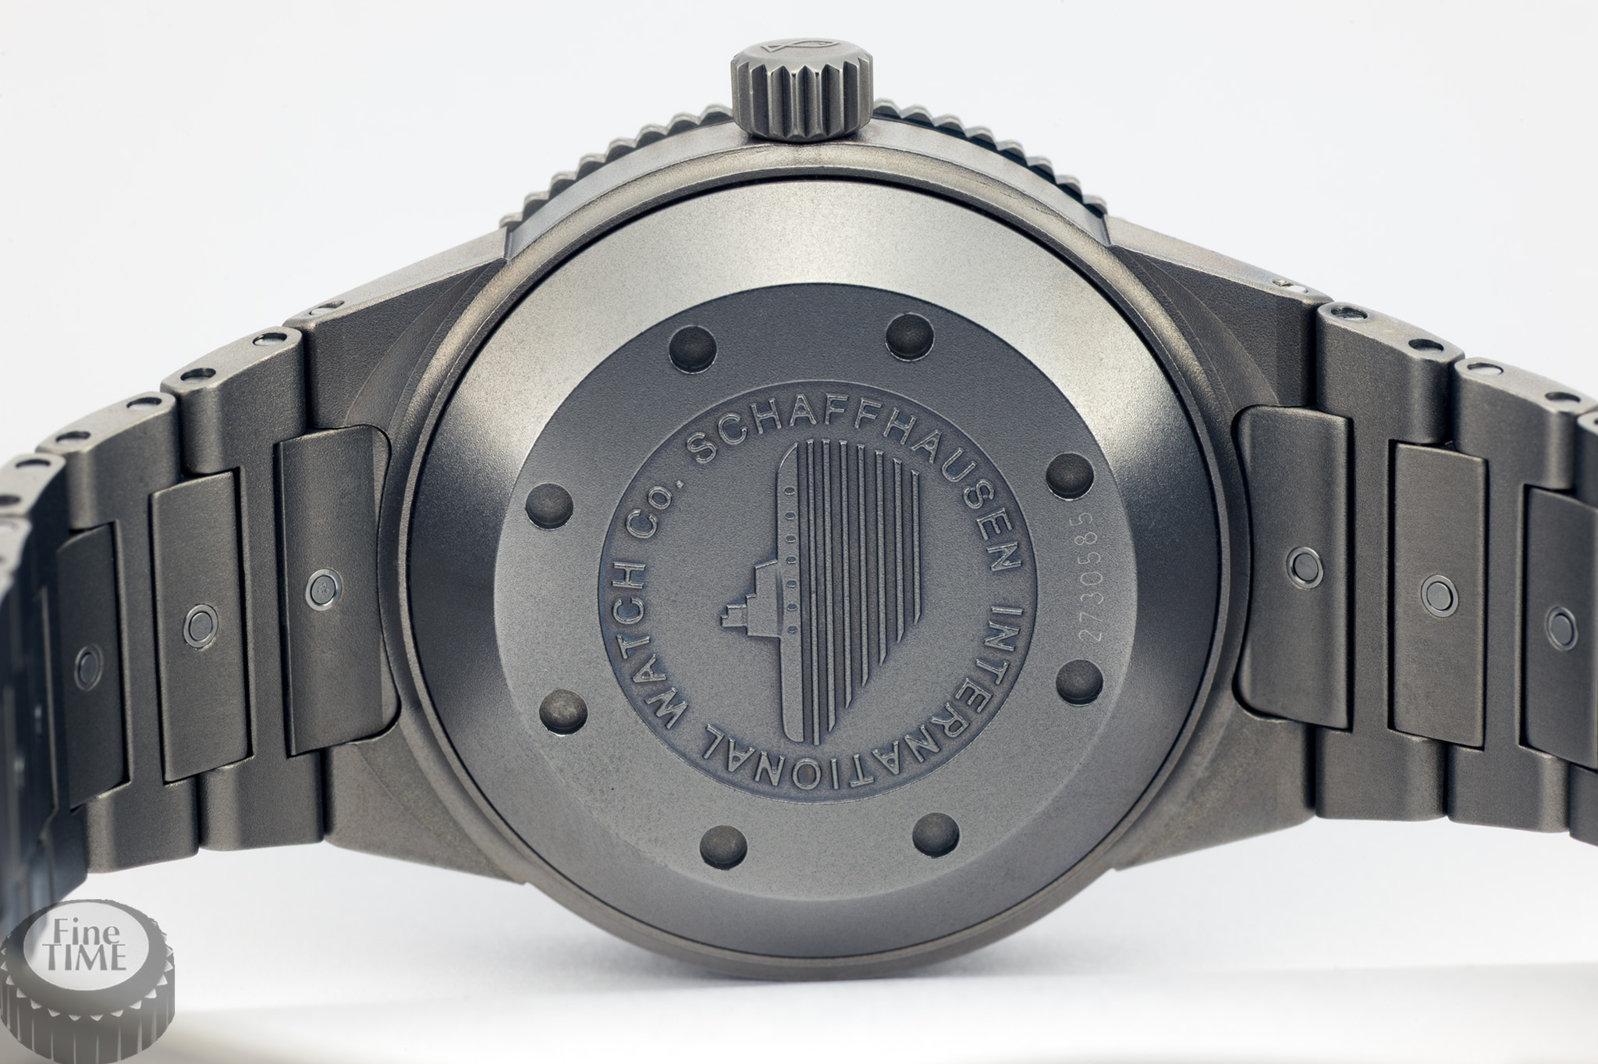 iwc-aquatimer-gst-iw3536-001-titanium-02.jpg